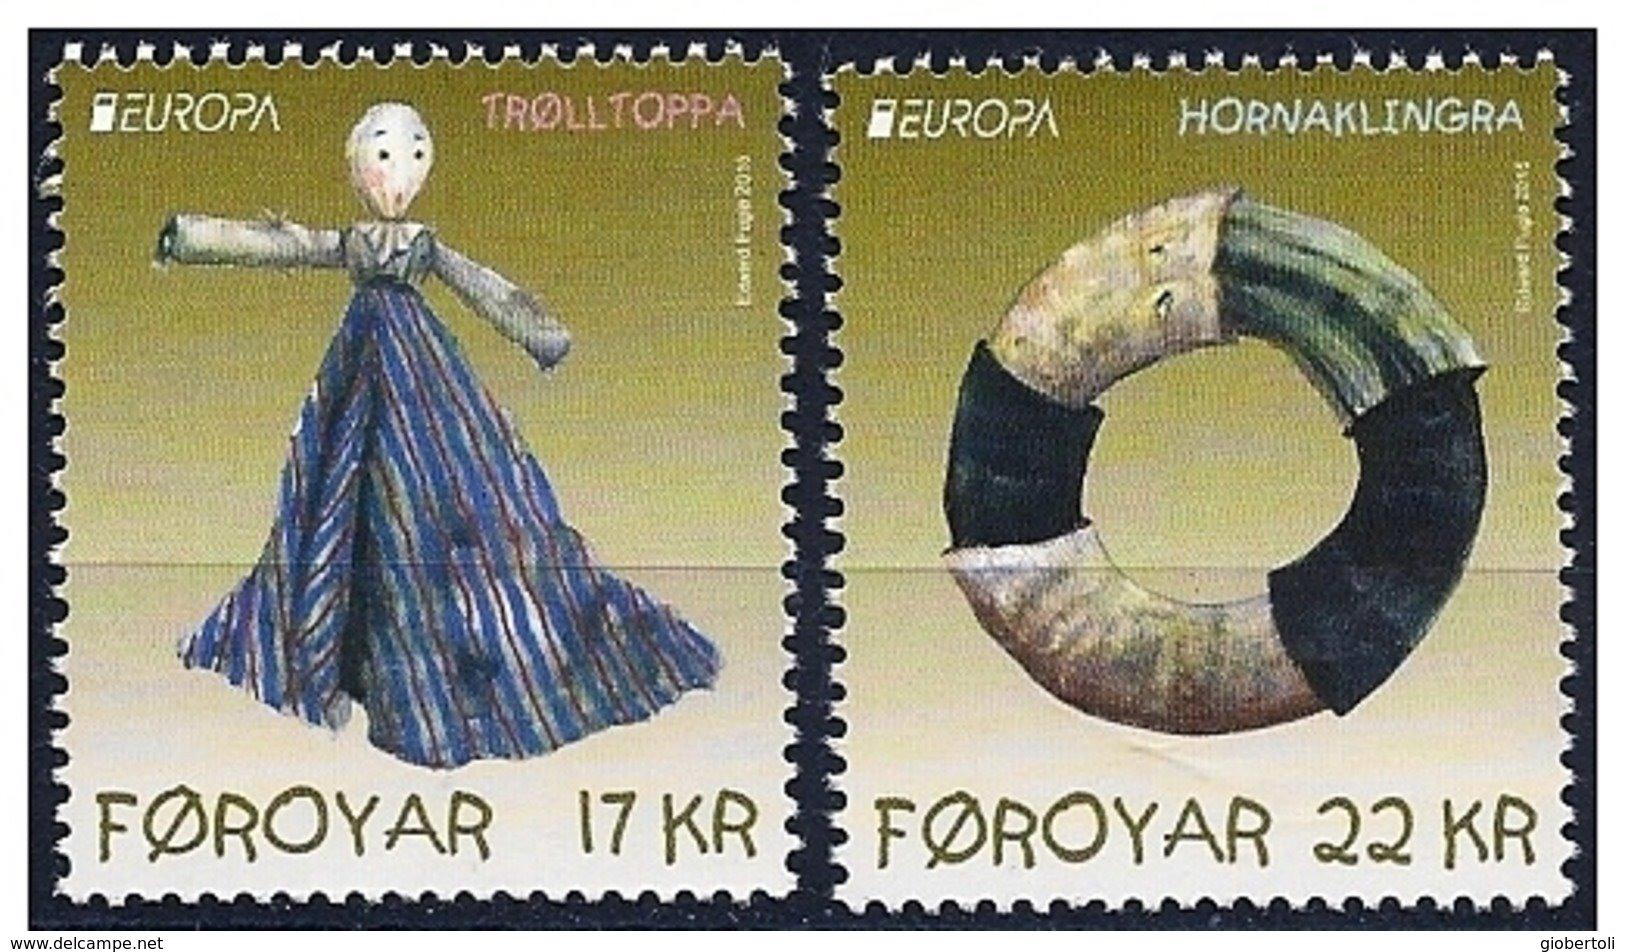 Faroer/Faroe/Féroé: Vecchi Giocattoli, Old Toys, Jouets Anciens - Puppen